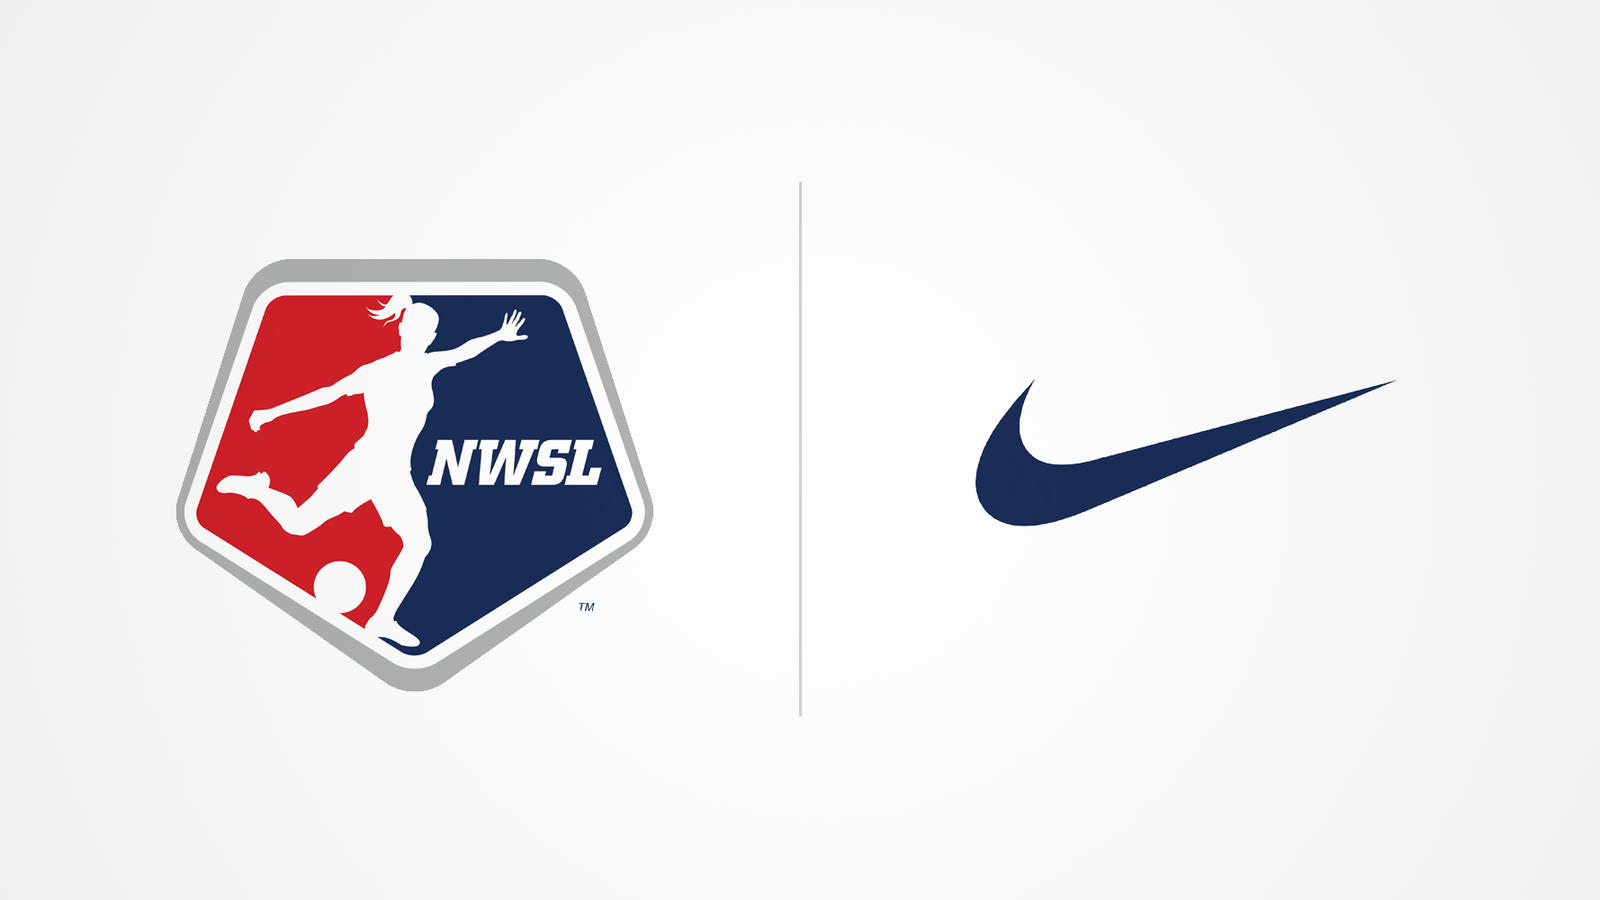 nike-x-nwsl-extended-partnership